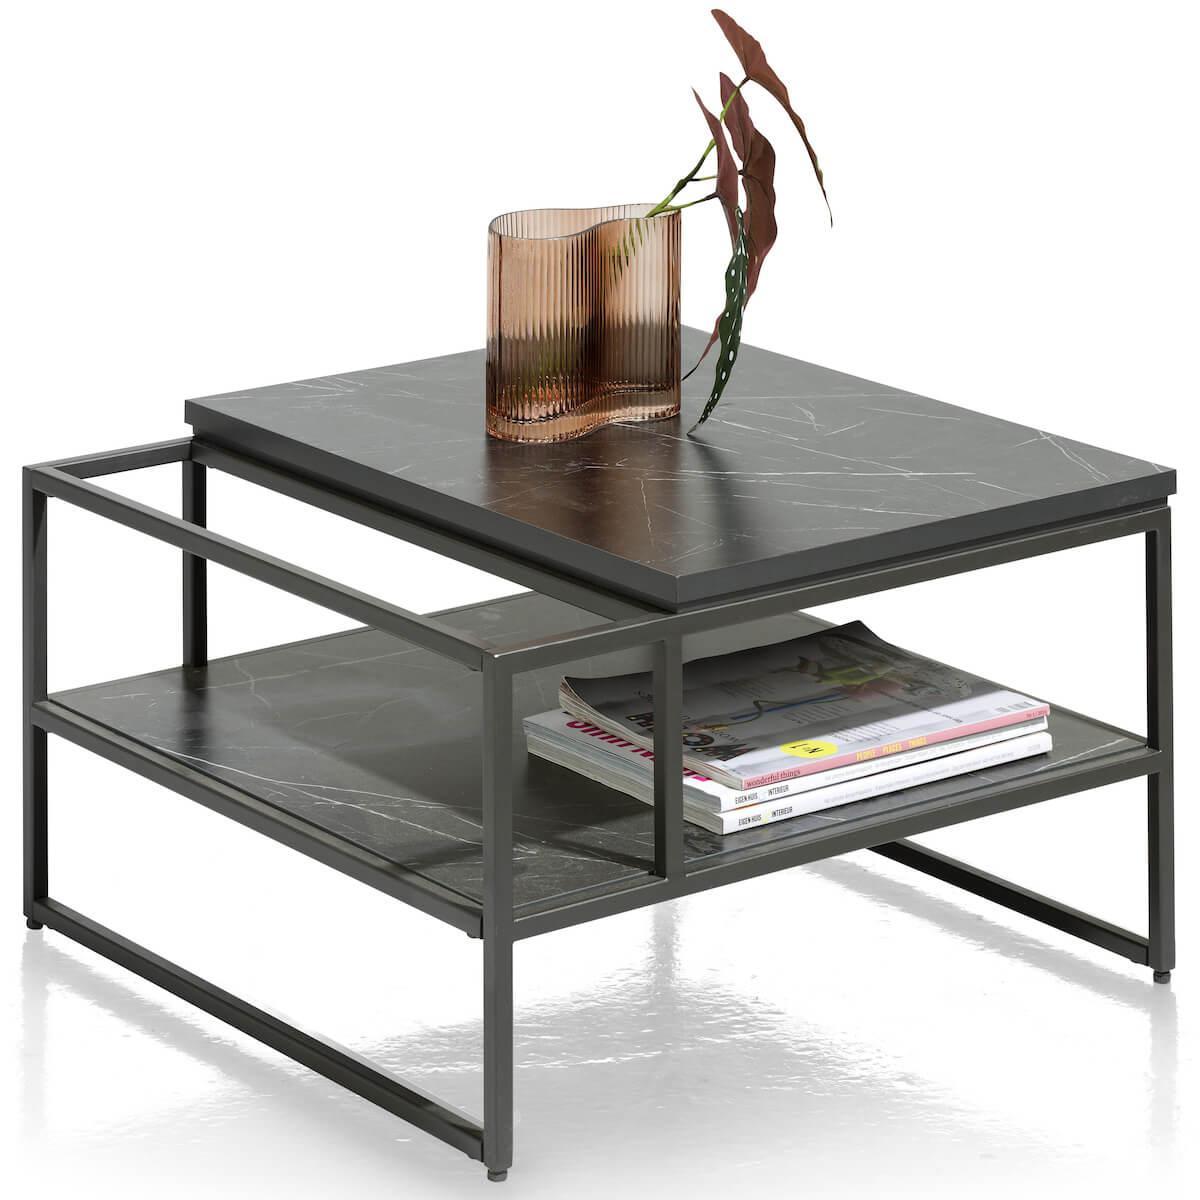 Table d'appoint 60x60cm BOGOTA Xooon